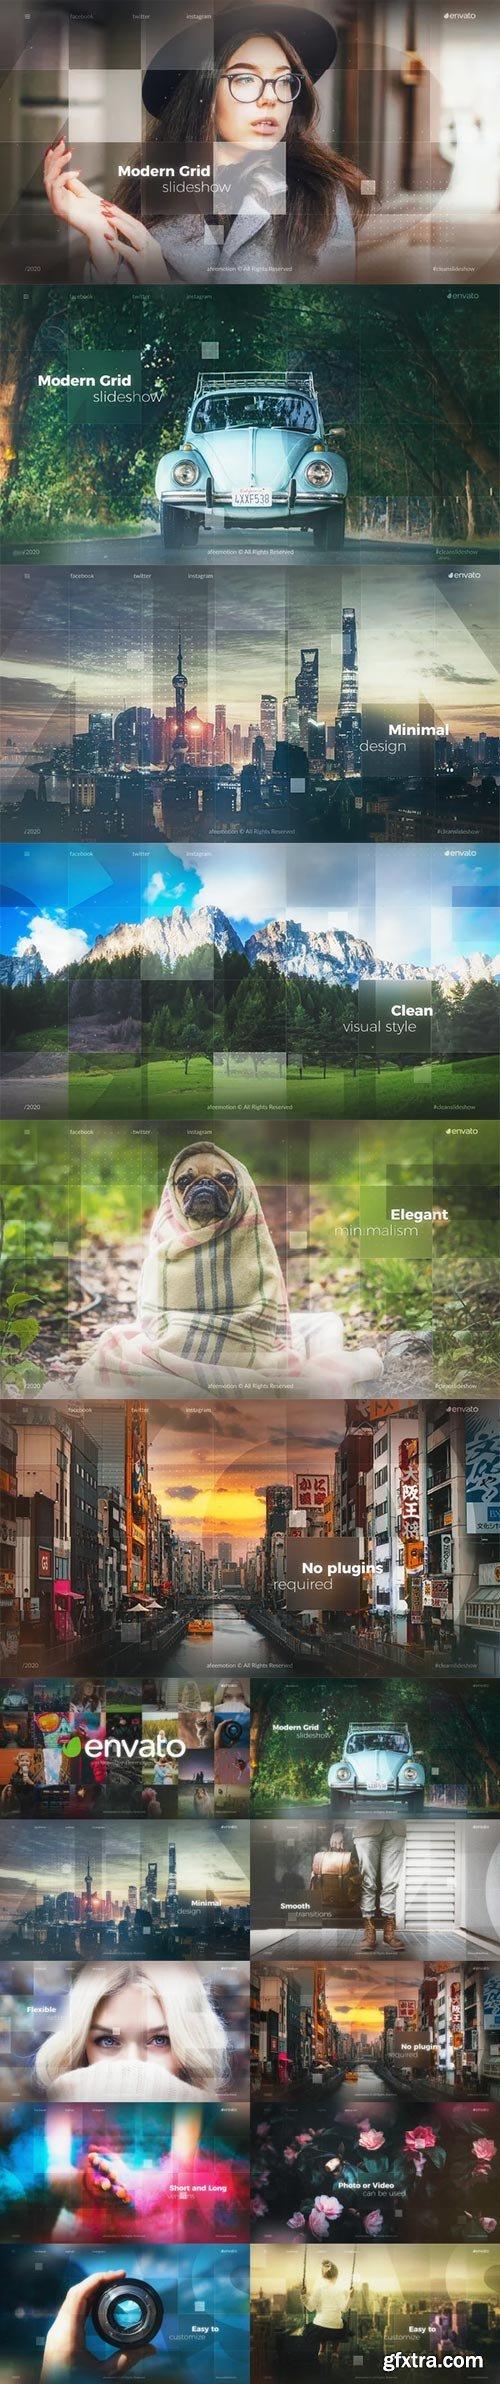 Videohive - Modern Grid Slideshow - 29796409